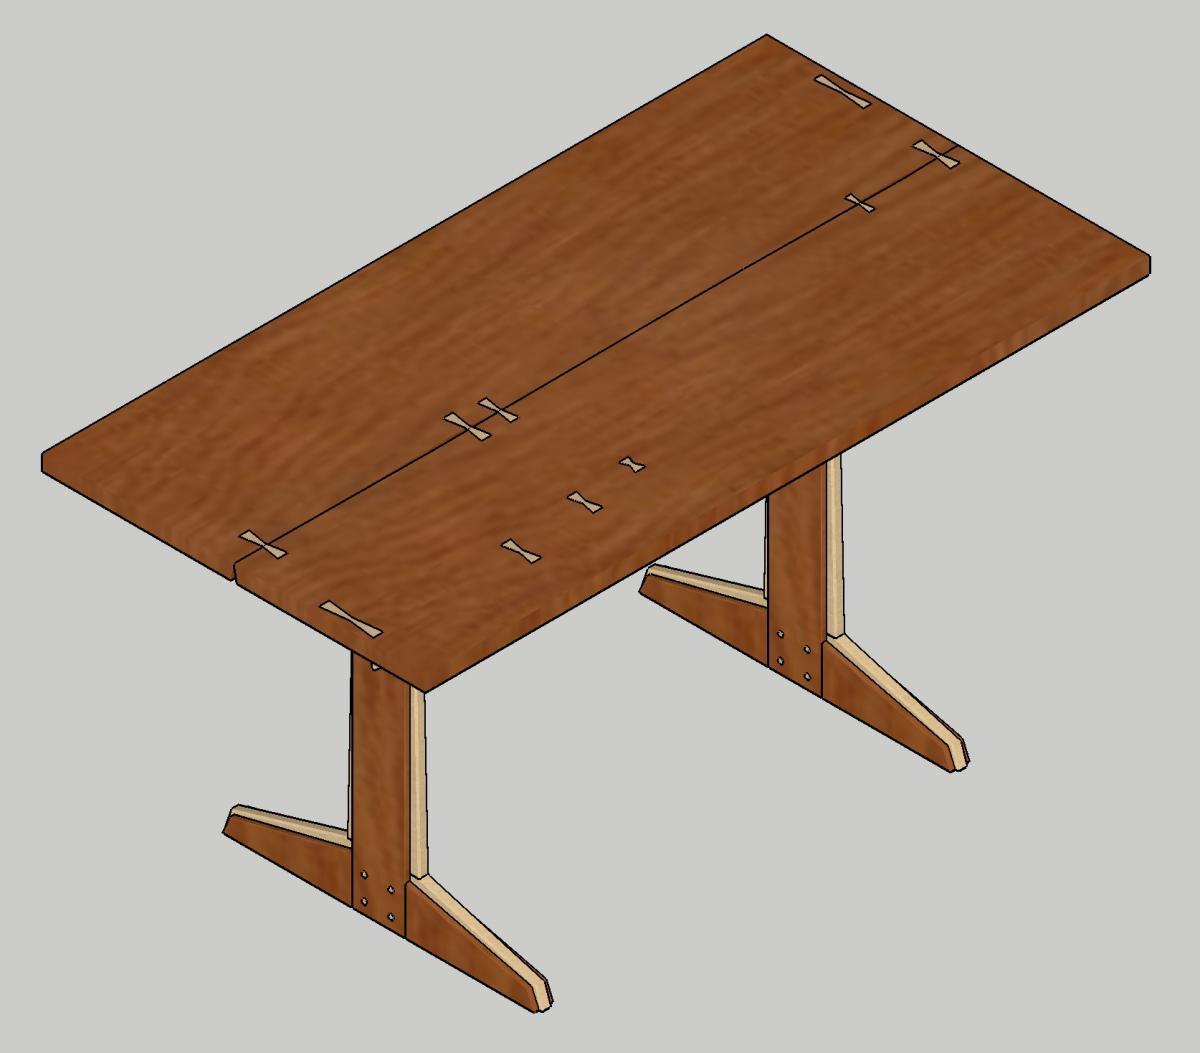 ishitani kigumi slab top table project journals wood talk online. Black Bedroom Furniture Sets. Home Design Ideas